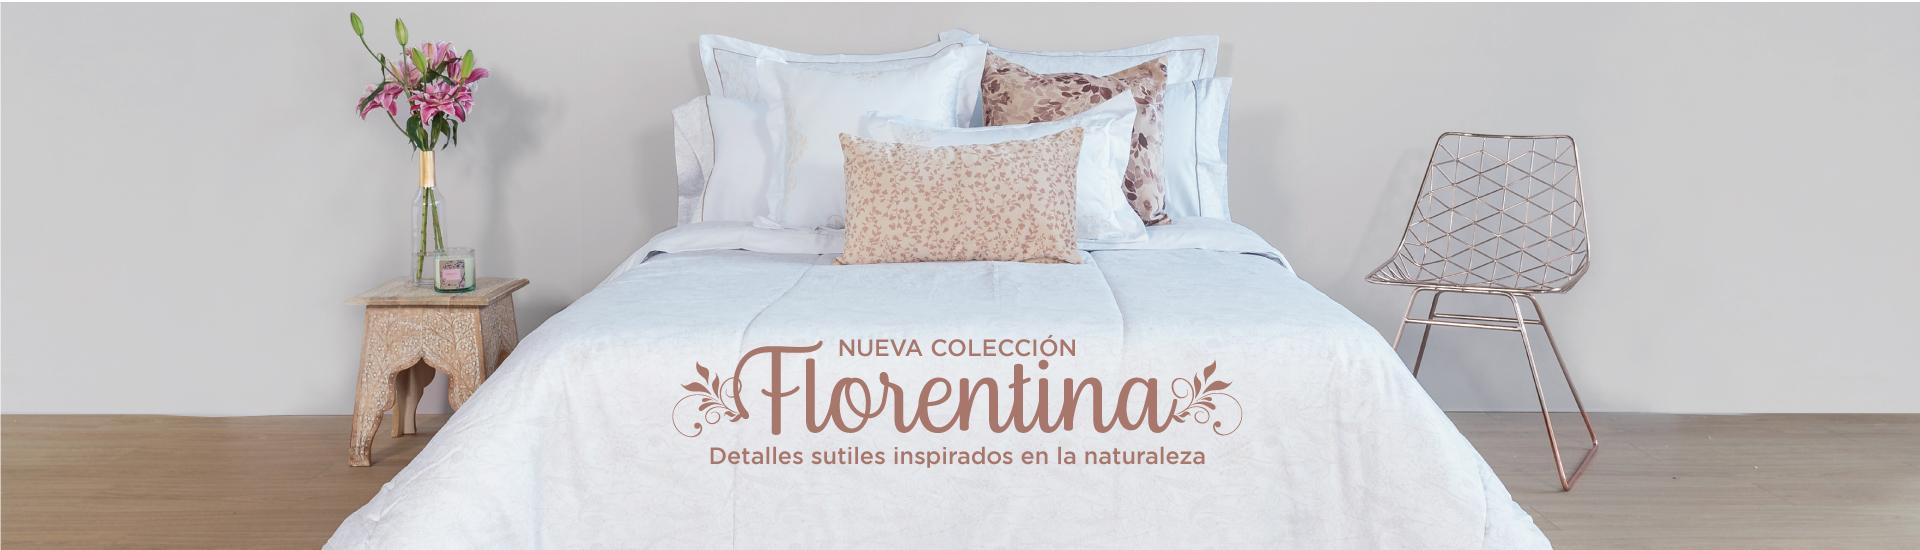 banner-Florentina